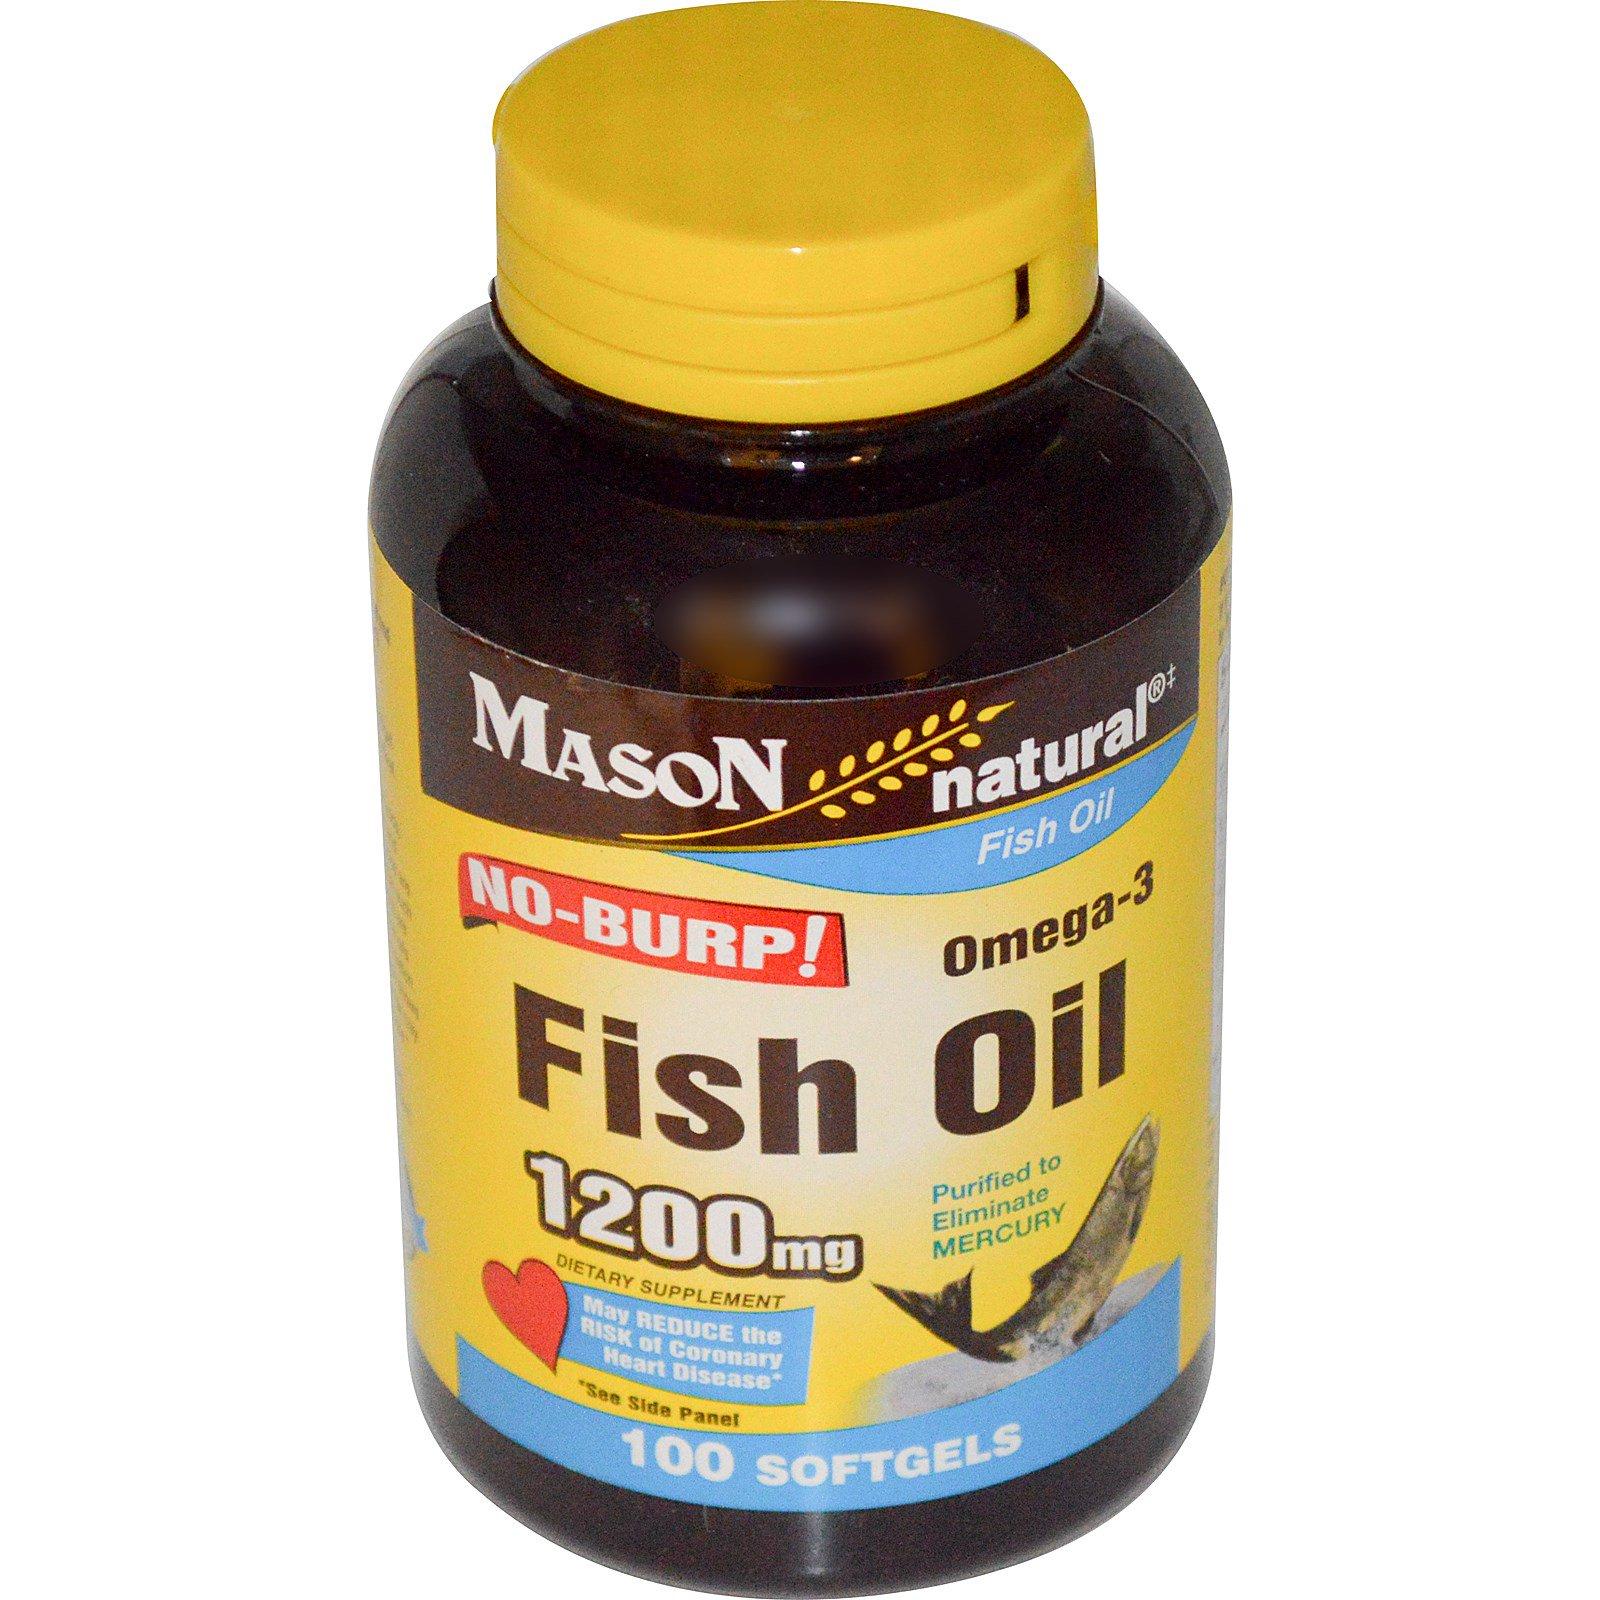 Mason natural omega 3 fish oil 1200 mg 100 softgels for Best omega 3 fish